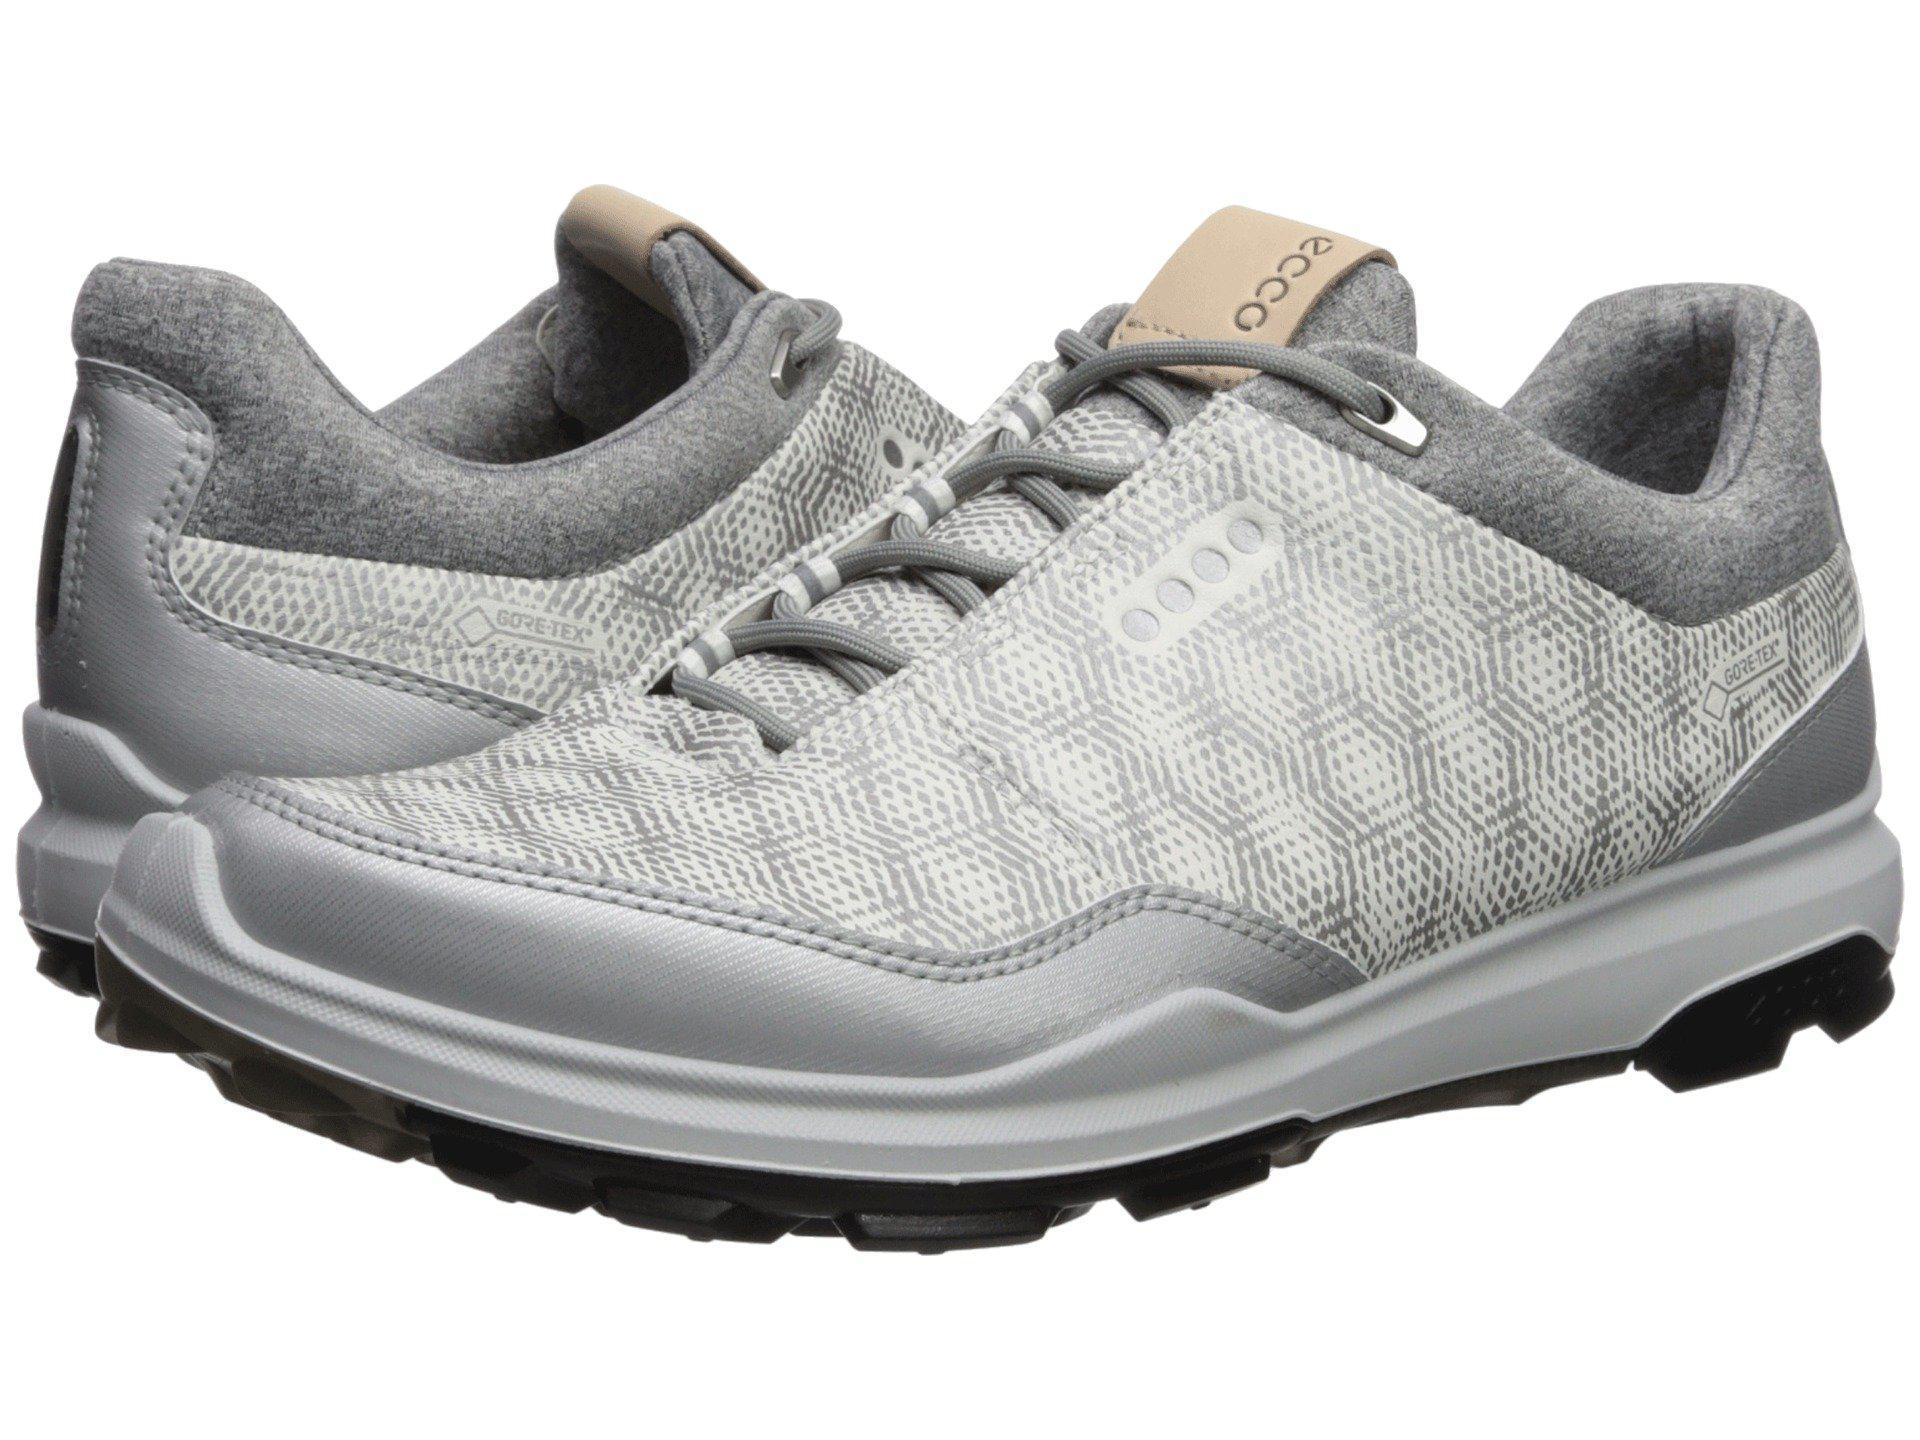 2500dcc34d59e Lyst - Ecco Biom Hybrid 3 Gtx (black/bermuda Blue) Men's Golf Shoes ...